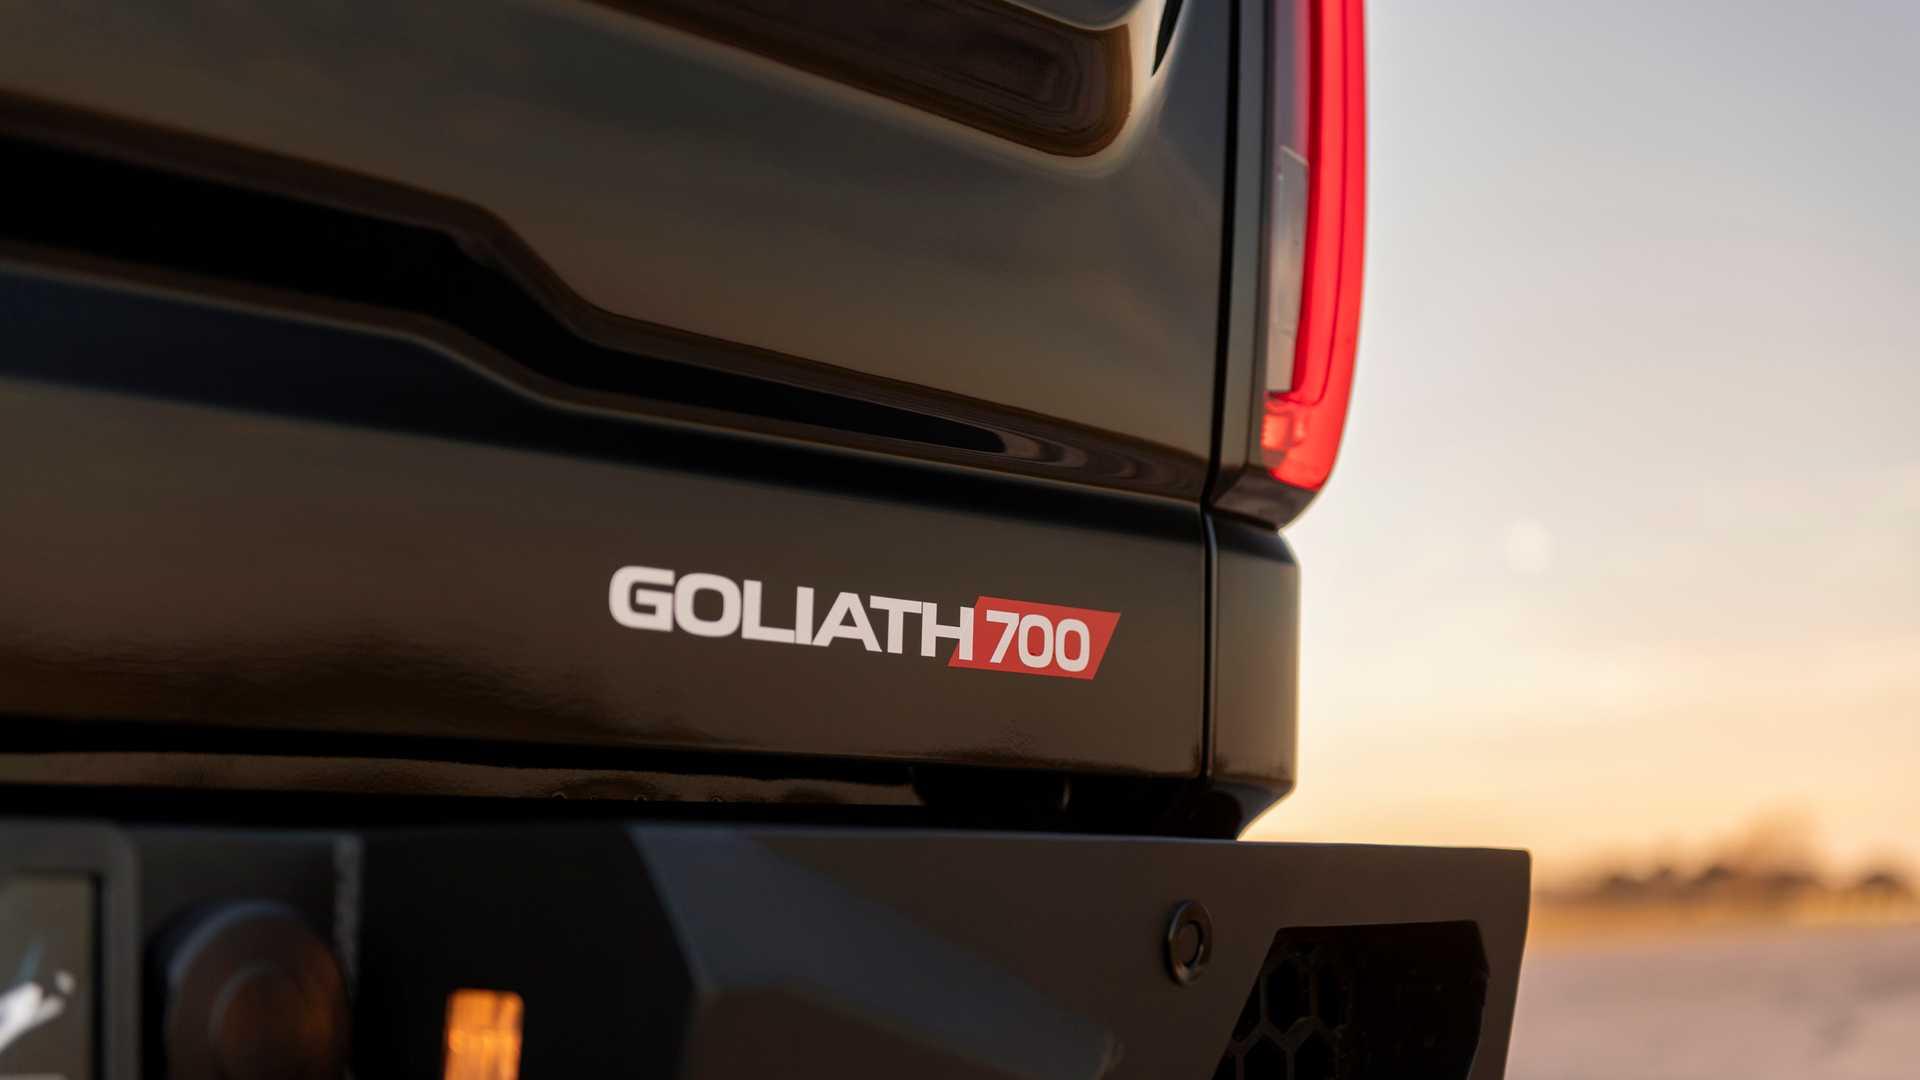 hennessey-goliath-700-gmc-sierra-denali-11